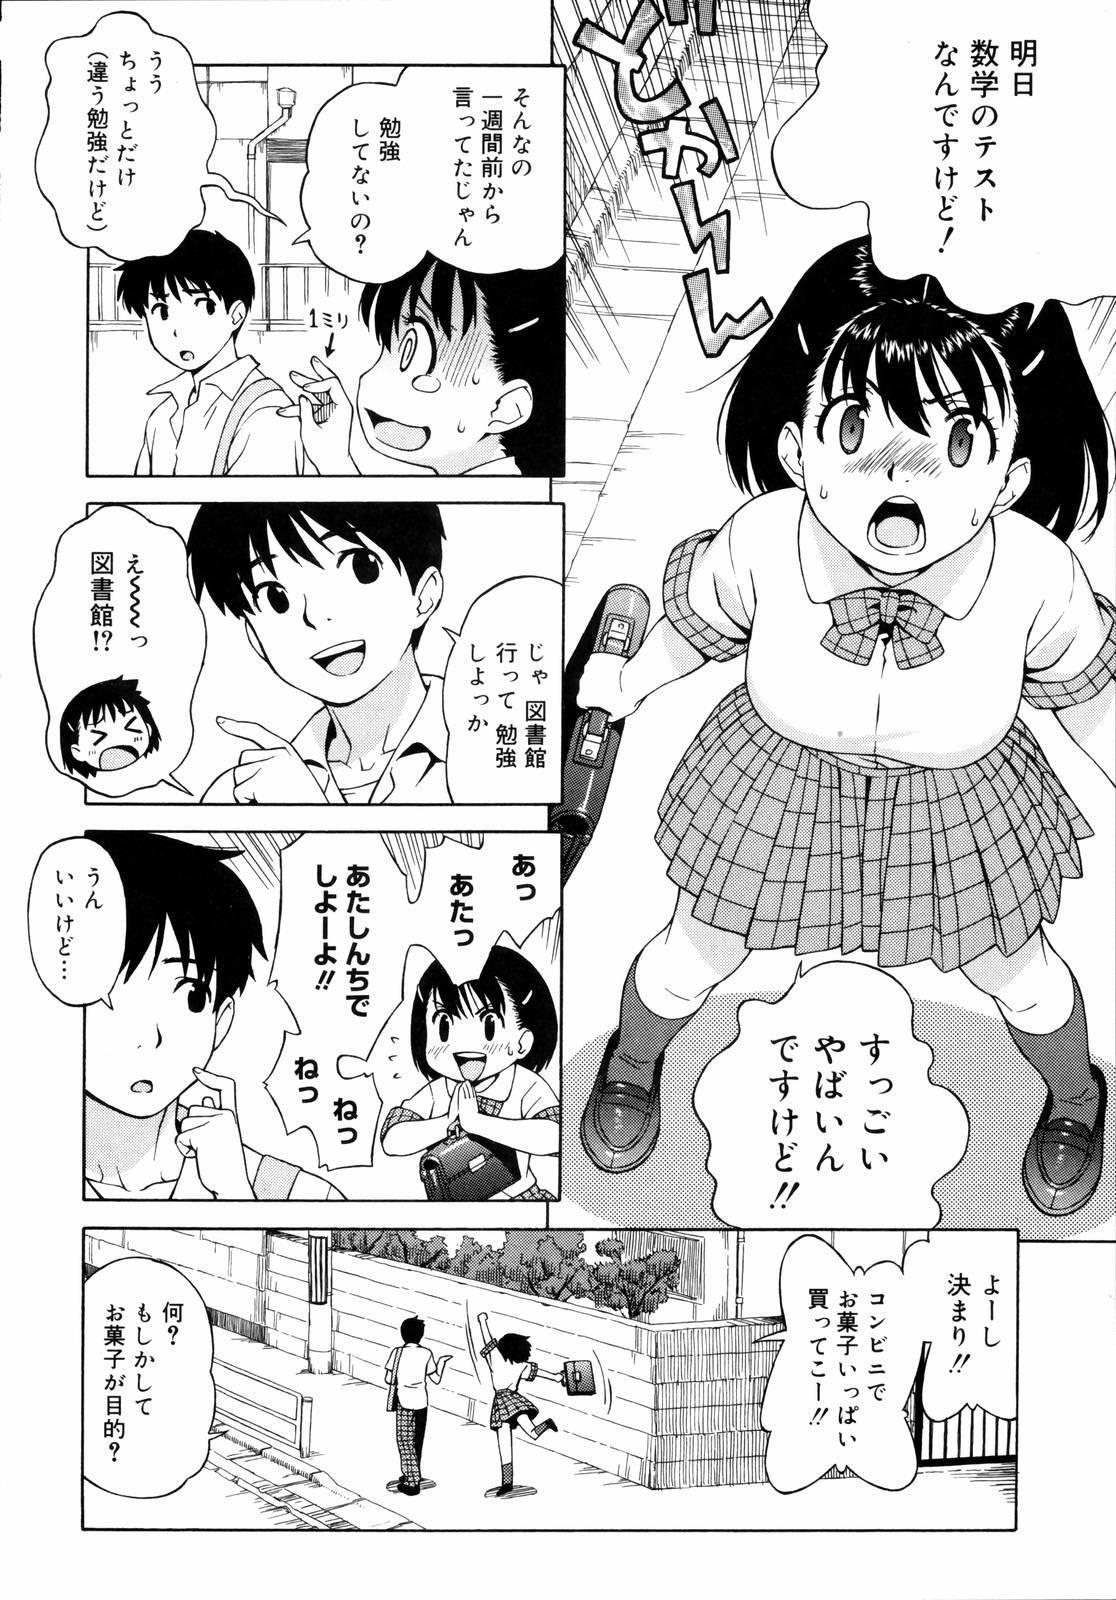 Shishunki wa Hatsujouki - Adolescence is a sexual excitement period. 47